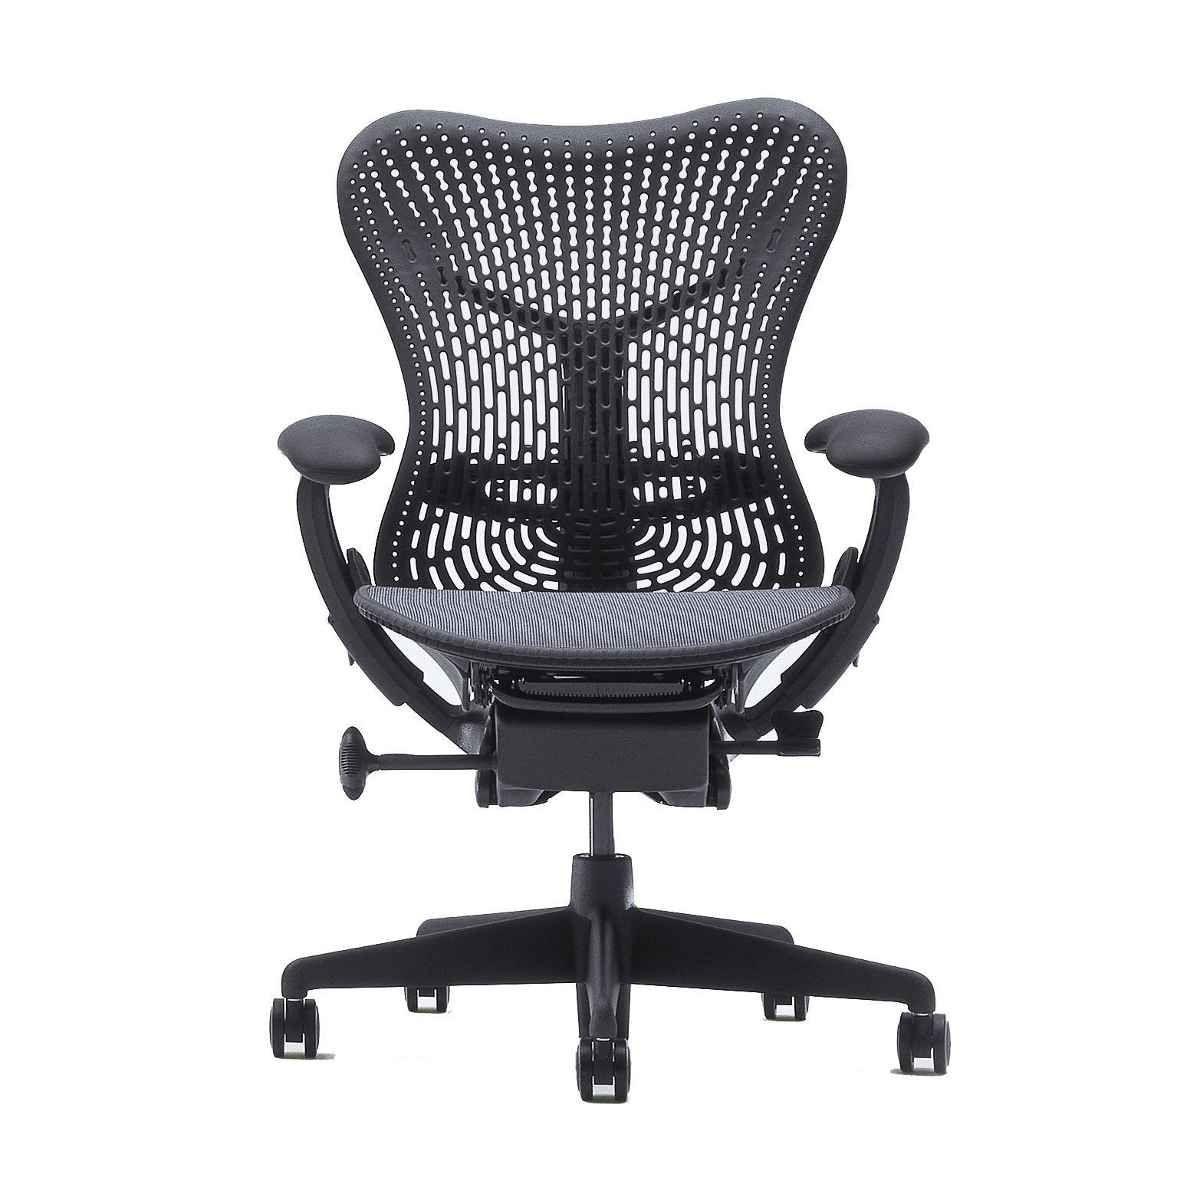 2019 Office Depot Mesh Chair Best Modern Furniture Check More At Http Www Fitnursetaylor